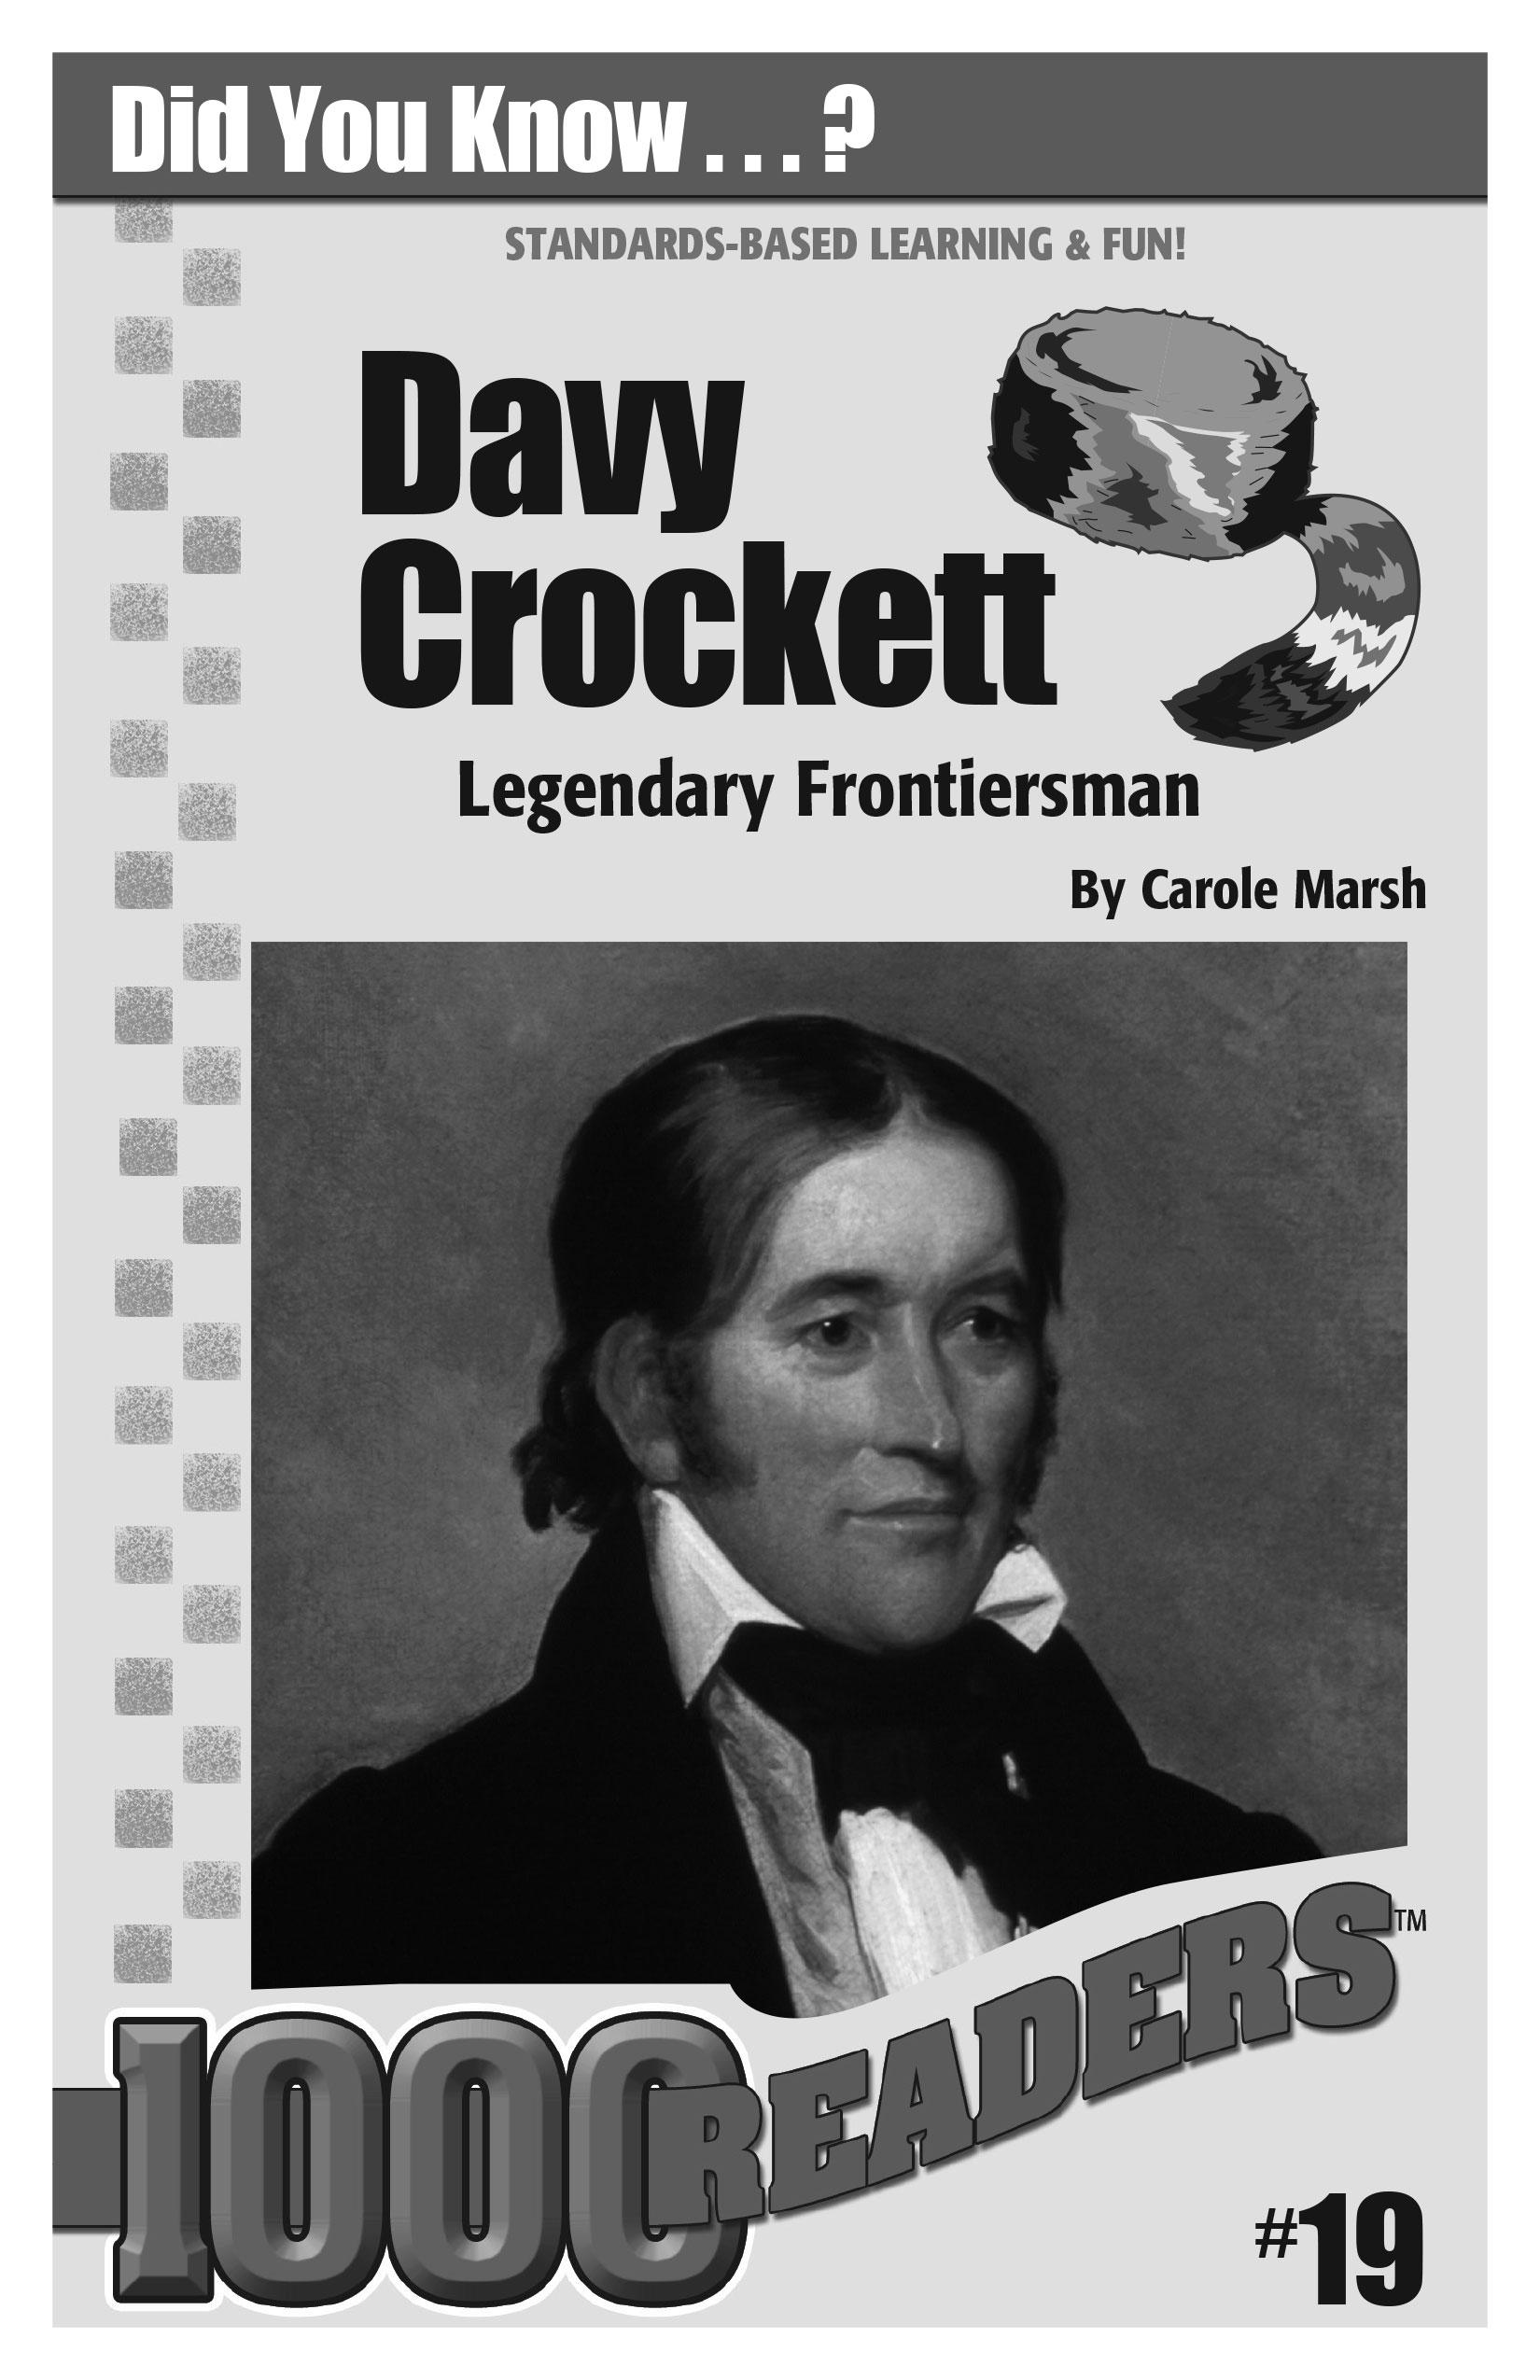 Davy Crockett: Legendary Frontiersman Consumable Pack 30